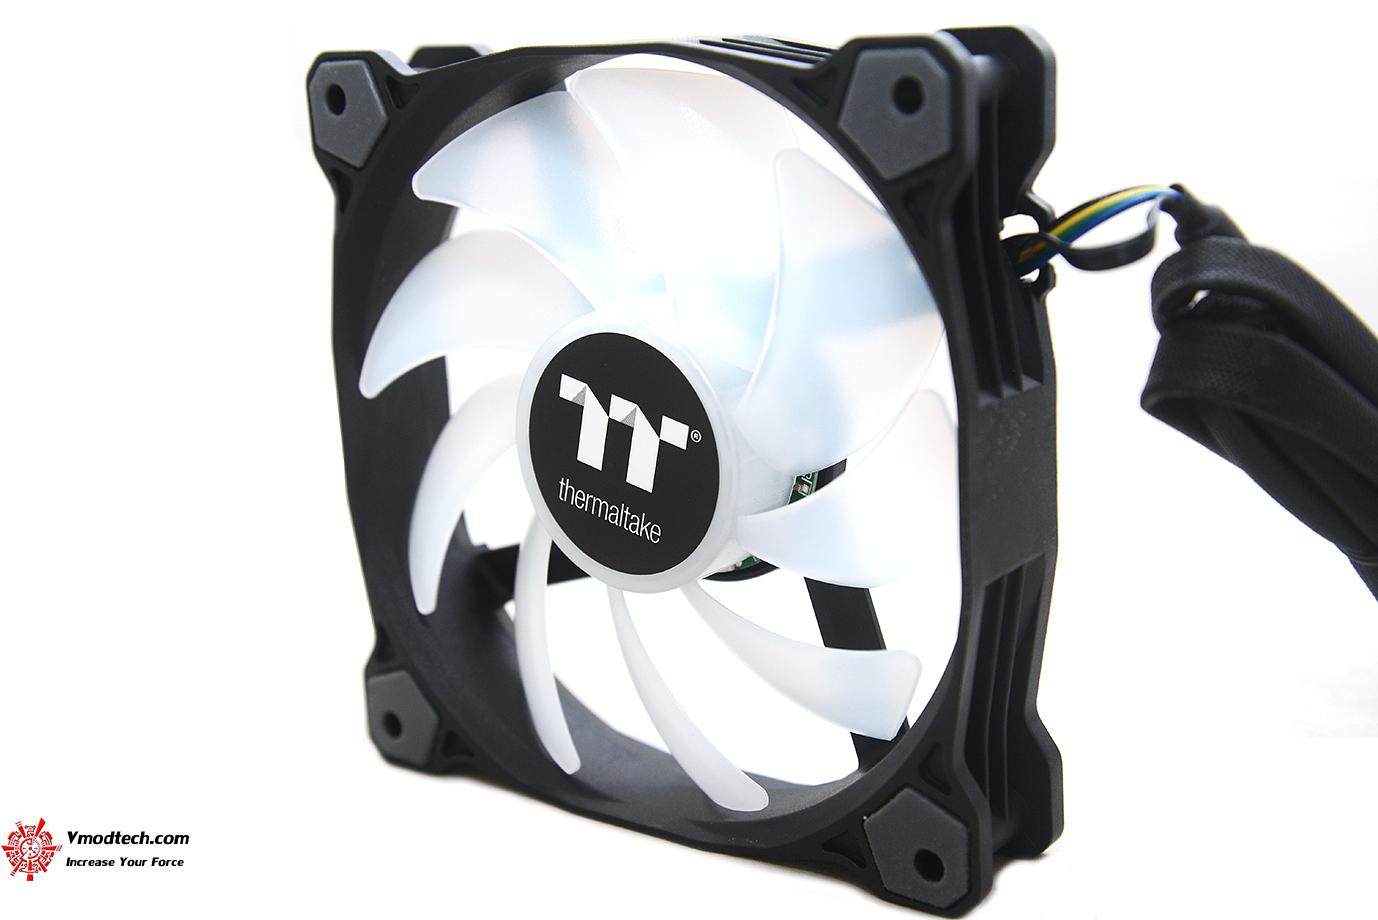 dsc 8864 Thermaltake Pure Plus 12 LED RGB Radiator Fan TT Premium Edition (3 Fan Pack) Review